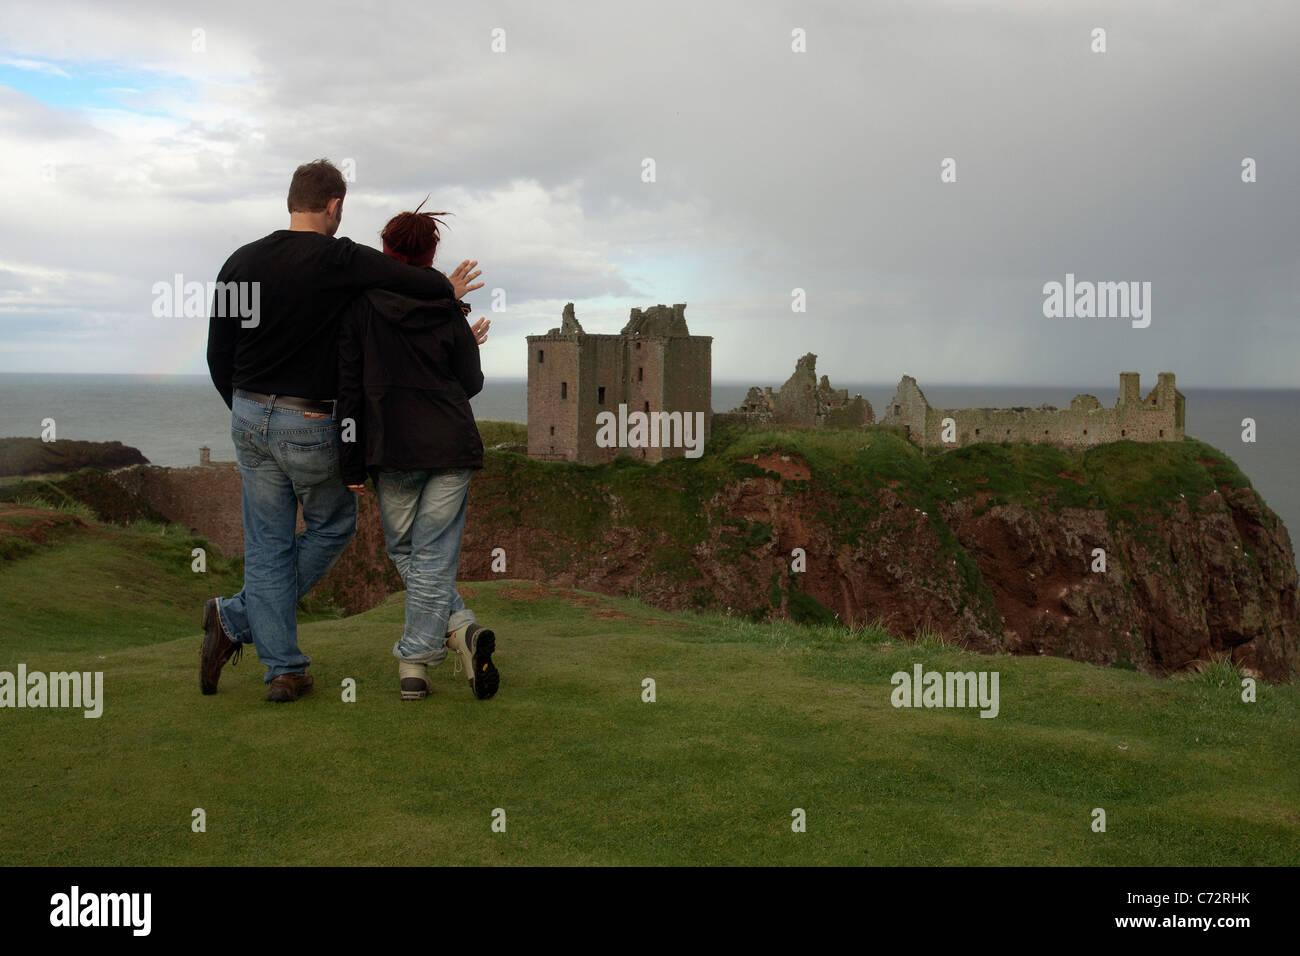 a couple at Dunnottar Castle stonehaven scotland - Stock Image